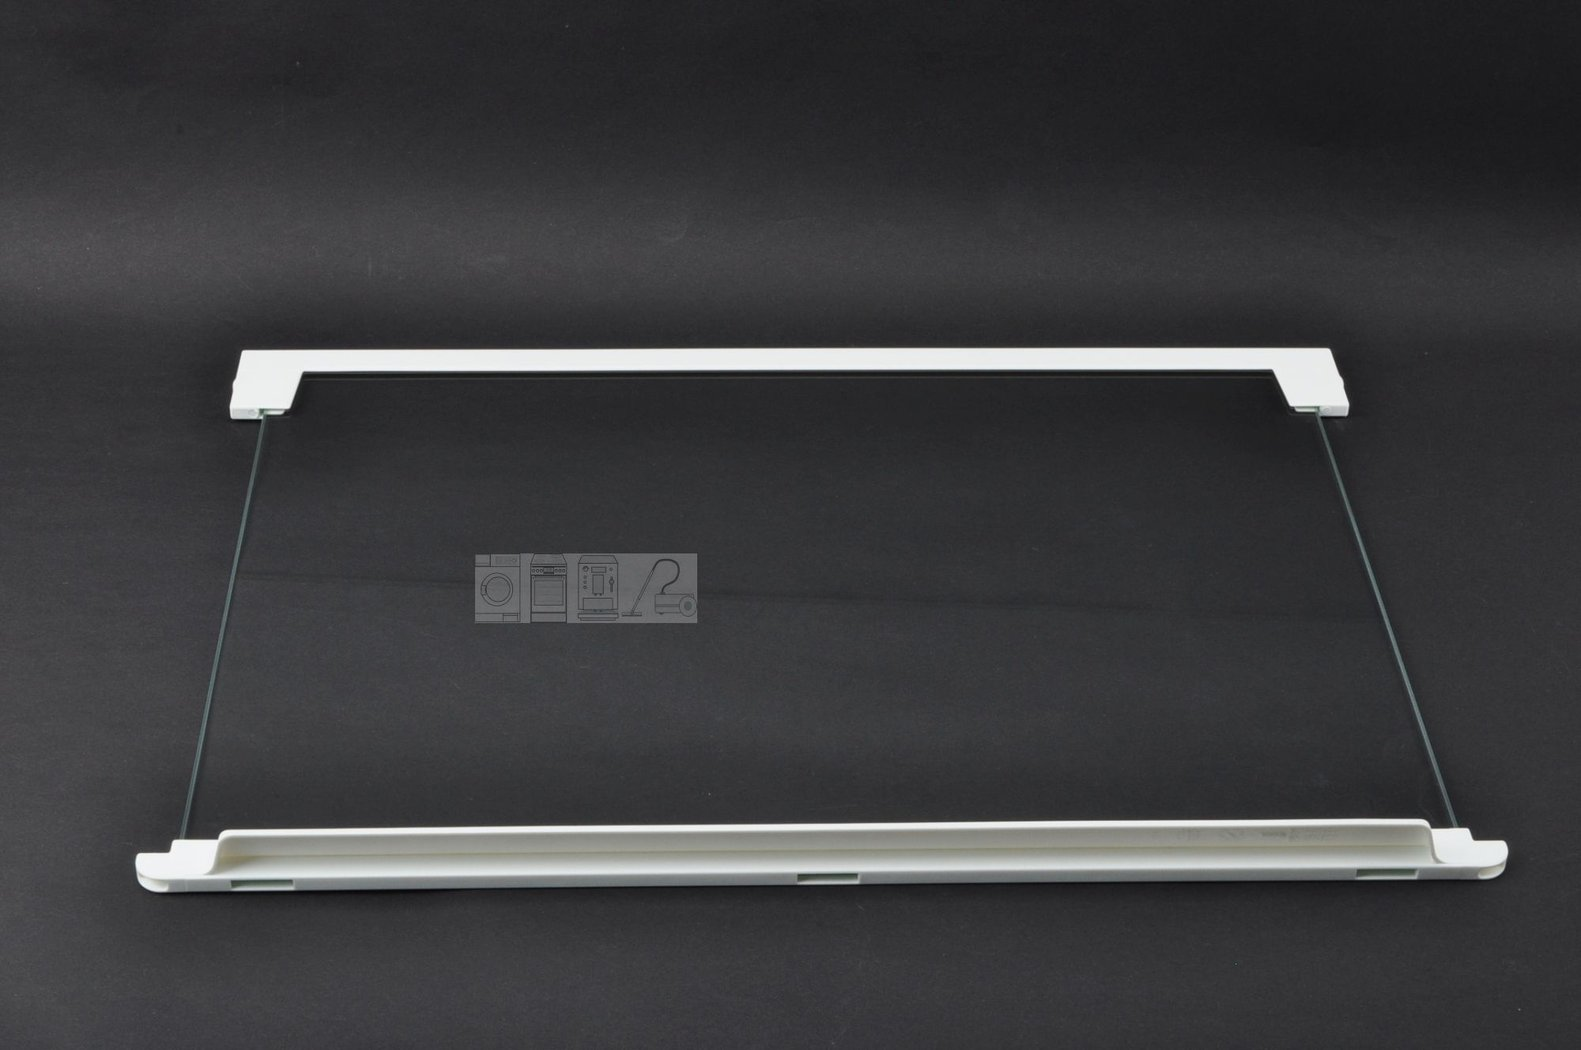 Kühlschrank Platte : Aeg glas platte ablage mm kühlschrank etc